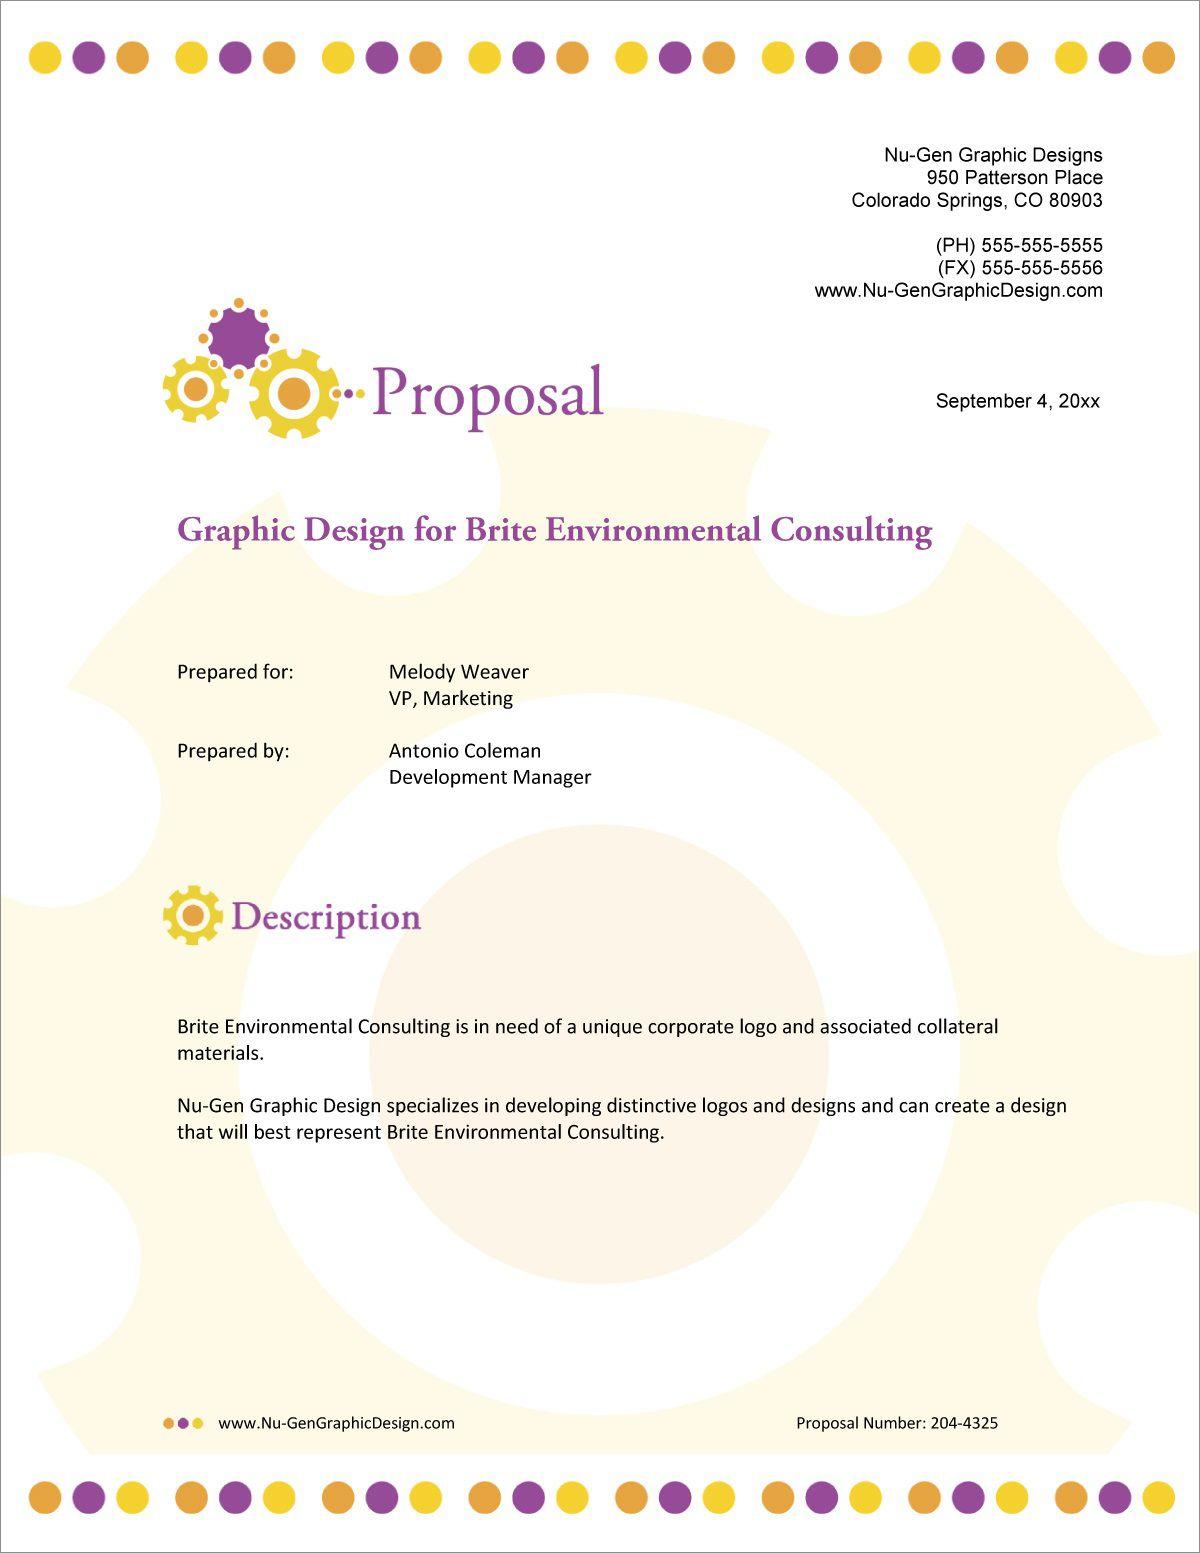 001 Incredible Graphic Design Proposal Sample Image  Pdf Free Template IndesignFull